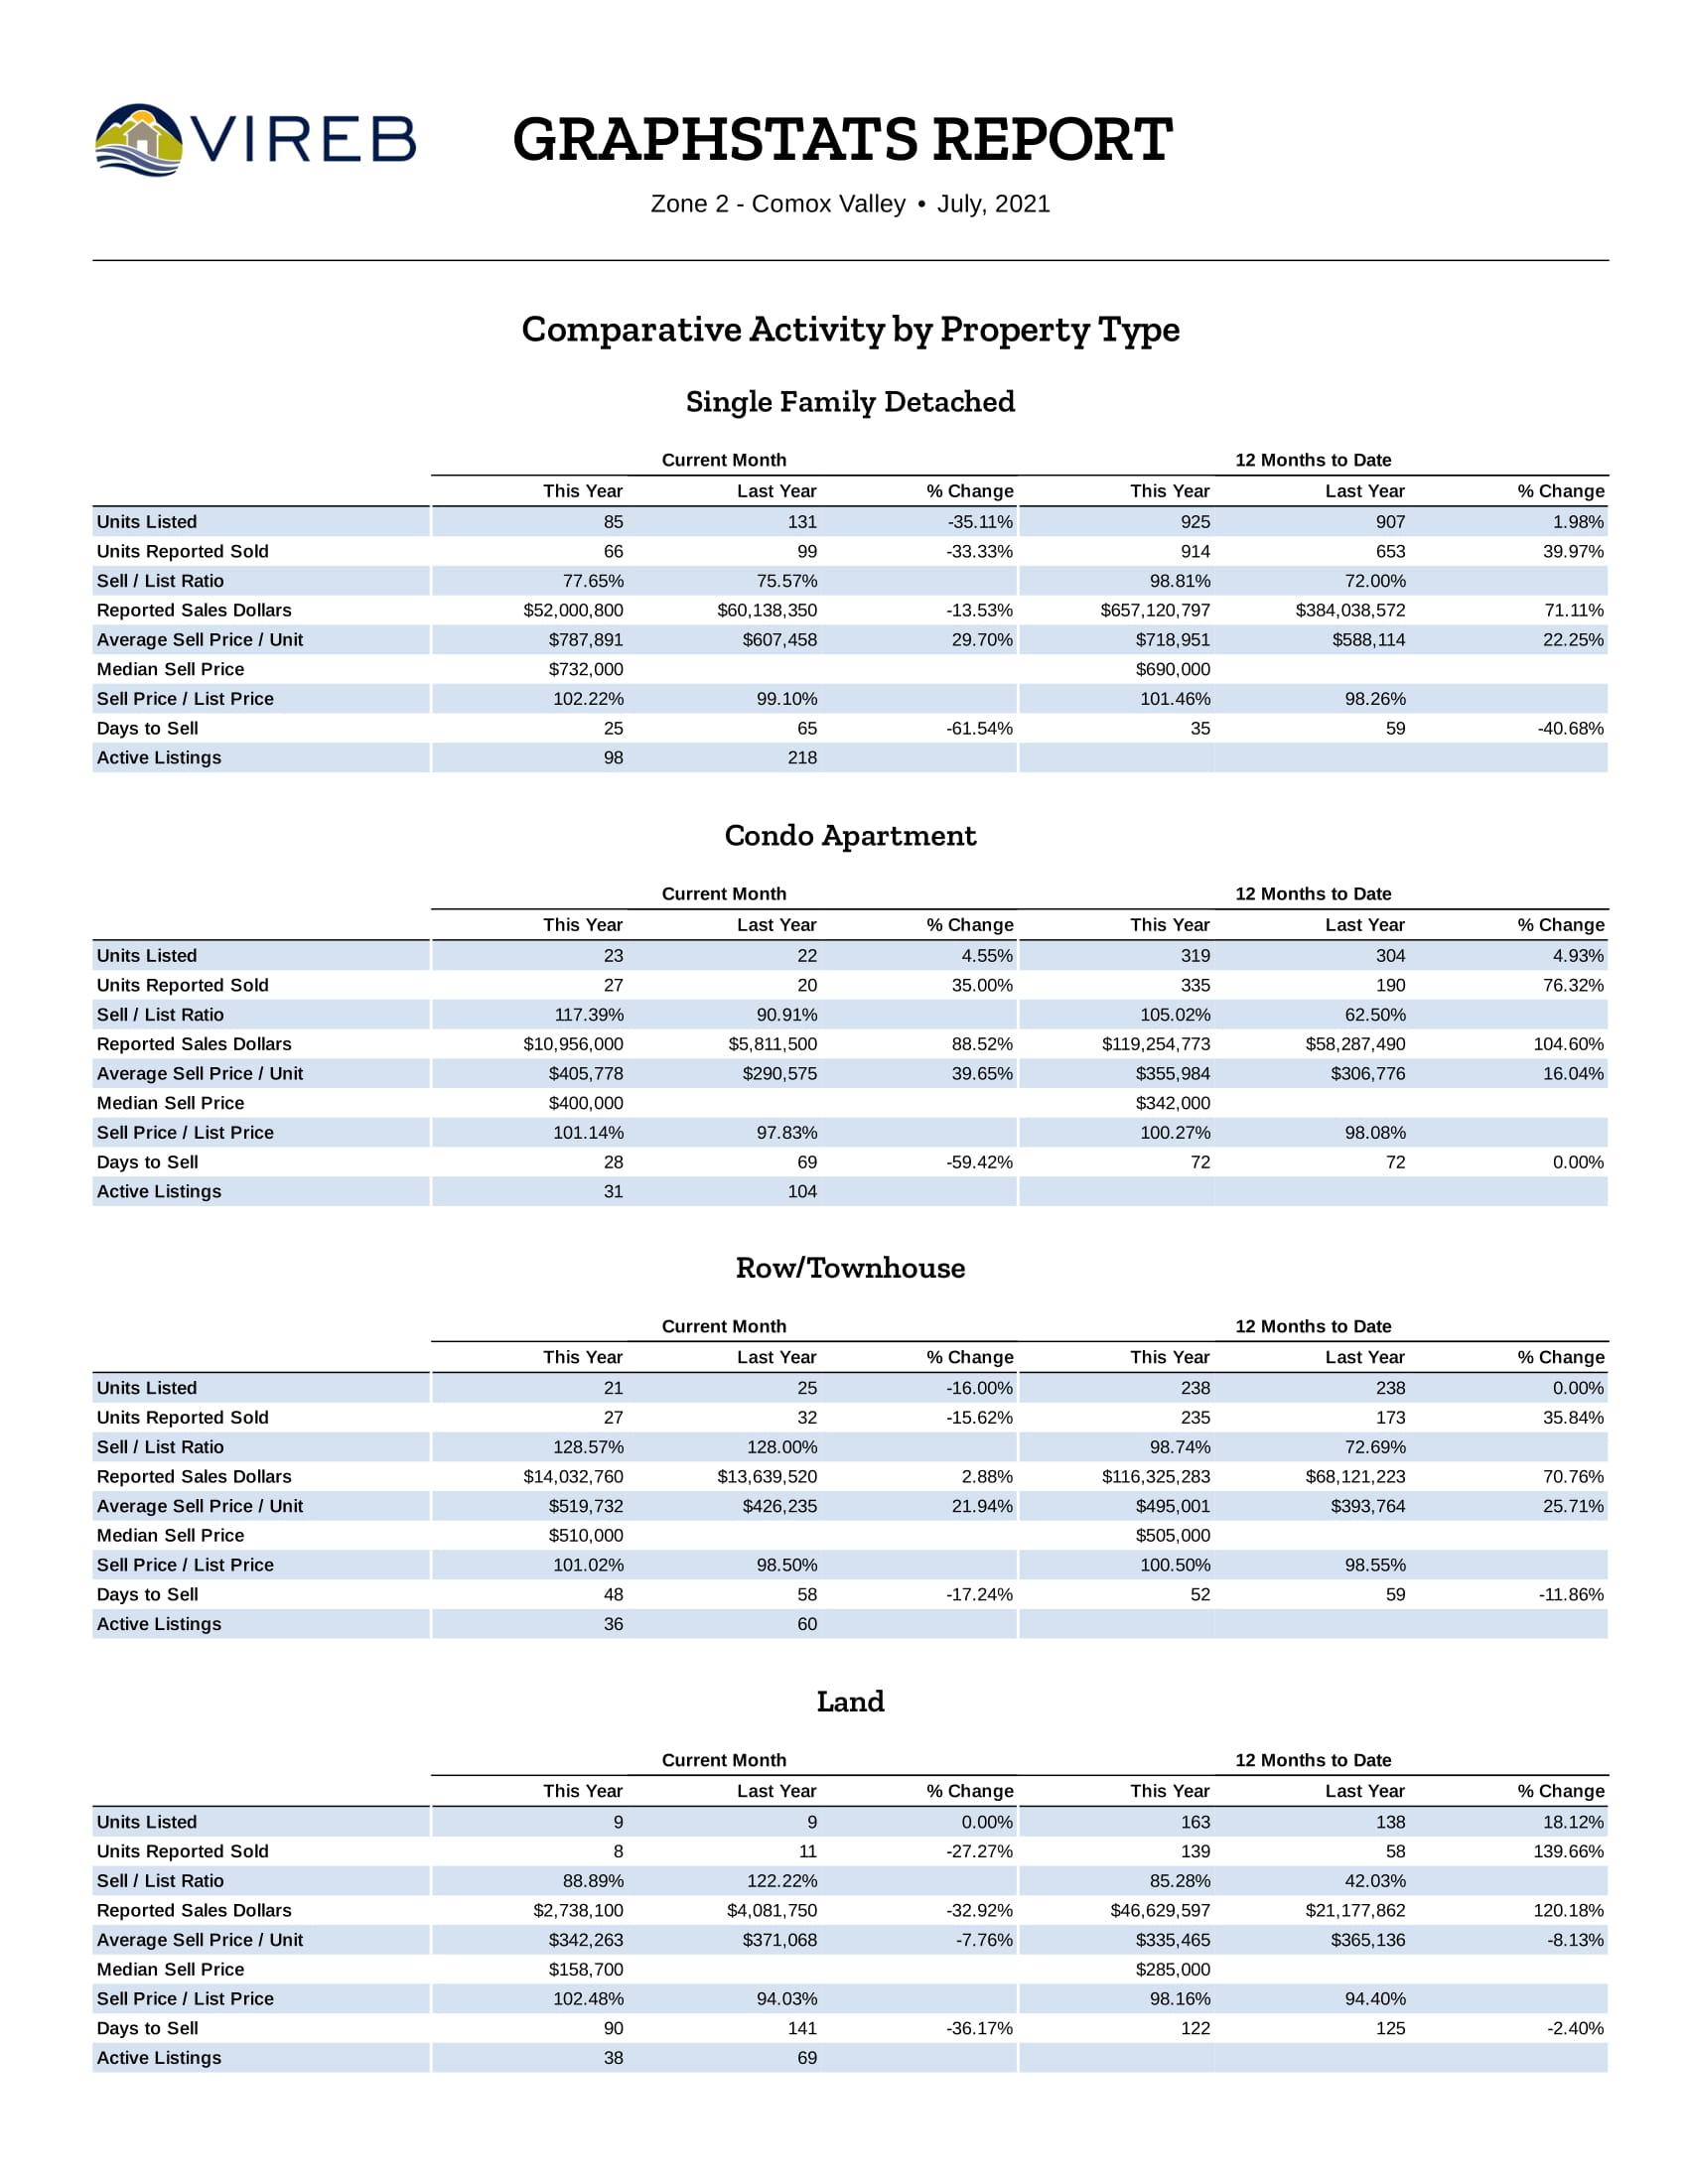 Comox Valley Real Estate Market Update - July 2021